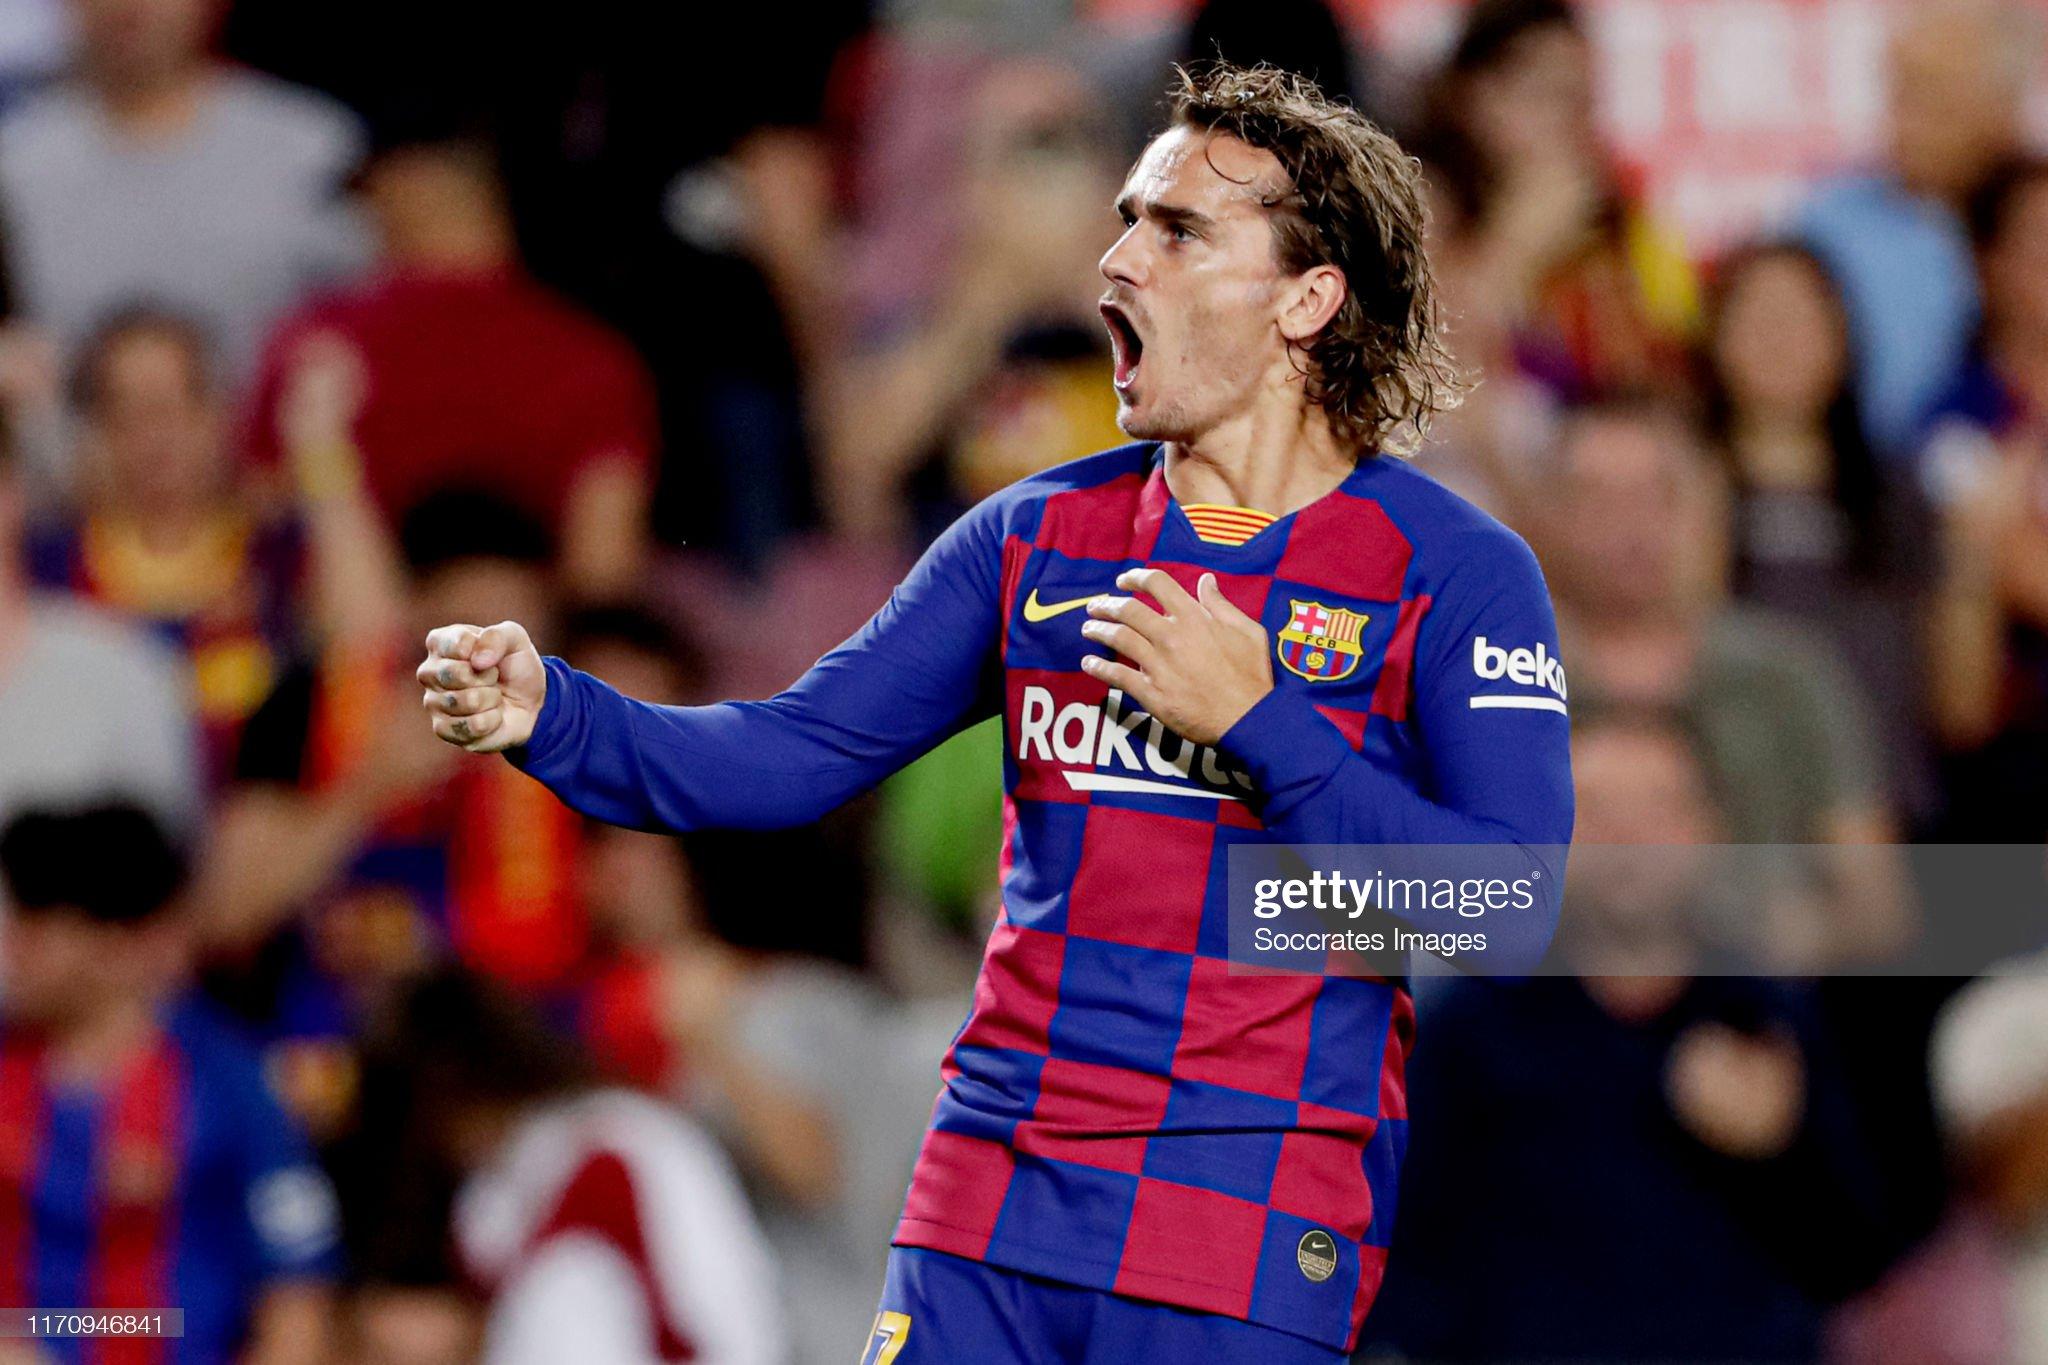 صور مباراة : برشلونة - فياريال 2-1 ( 24-09-2019 )  Antoine-griezmann-of-fc-barcelona-celebrates-10-during-the-la-liga-picture-id1170946841?s=2048x2048